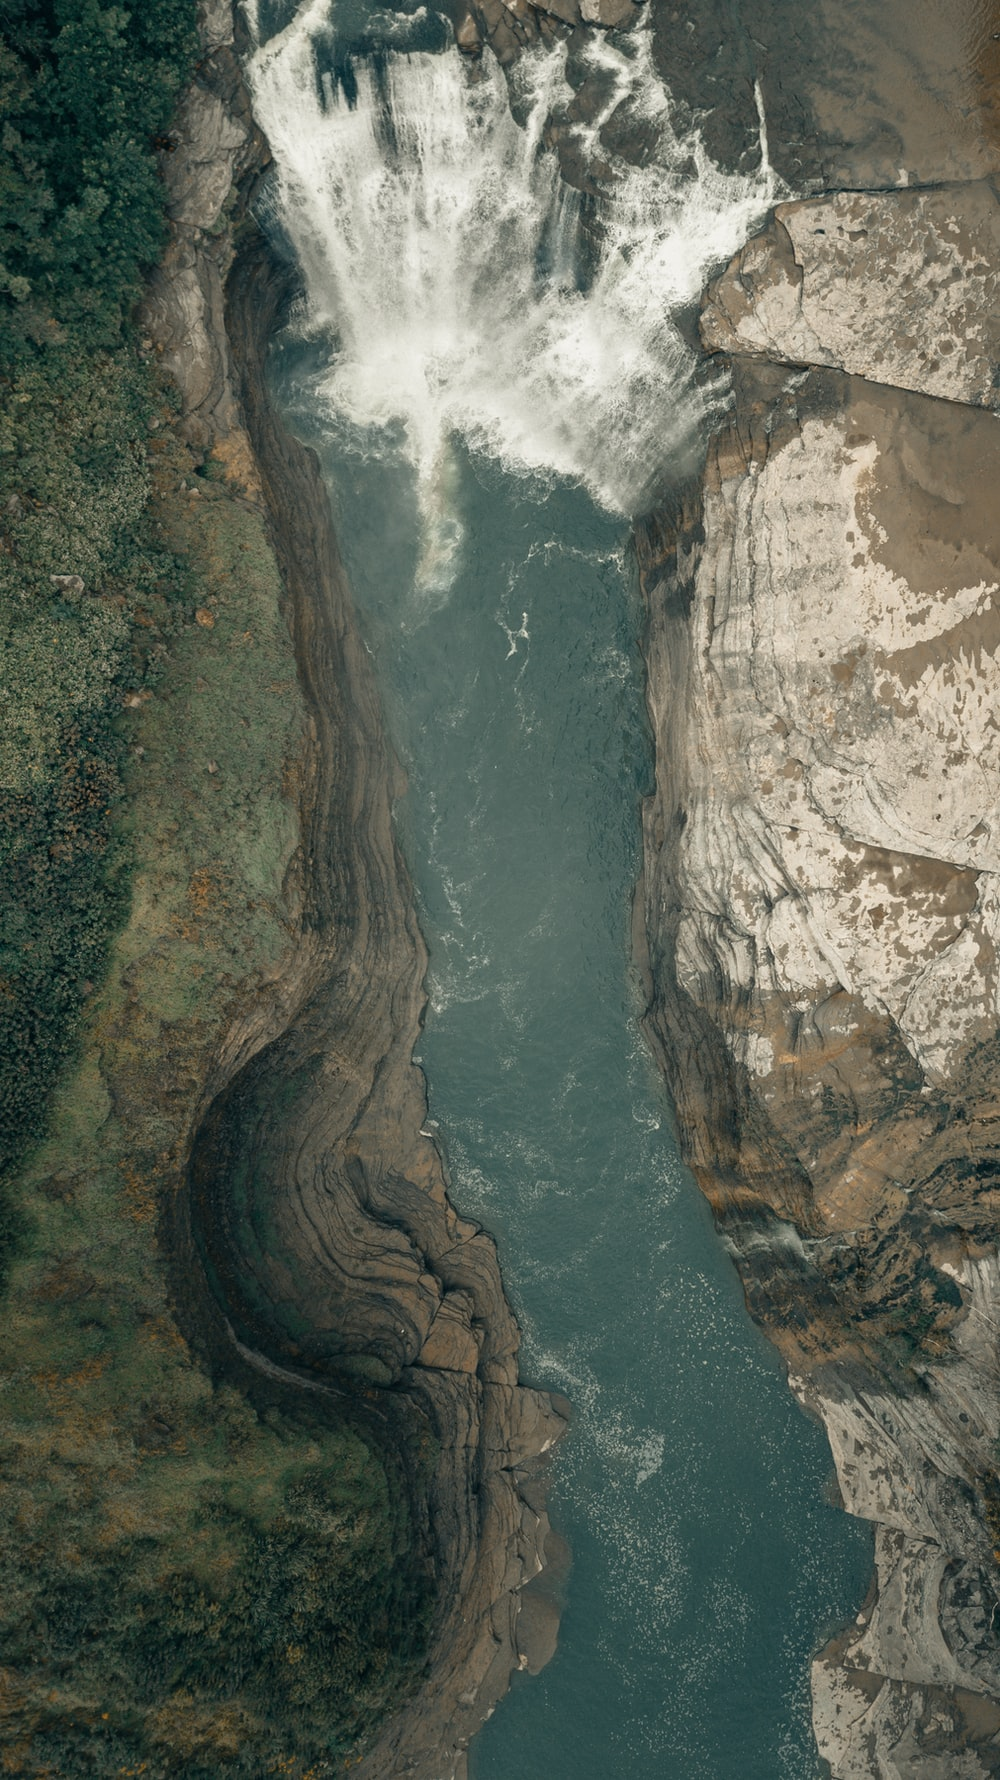 water falls between brown rocky mountain during daytime